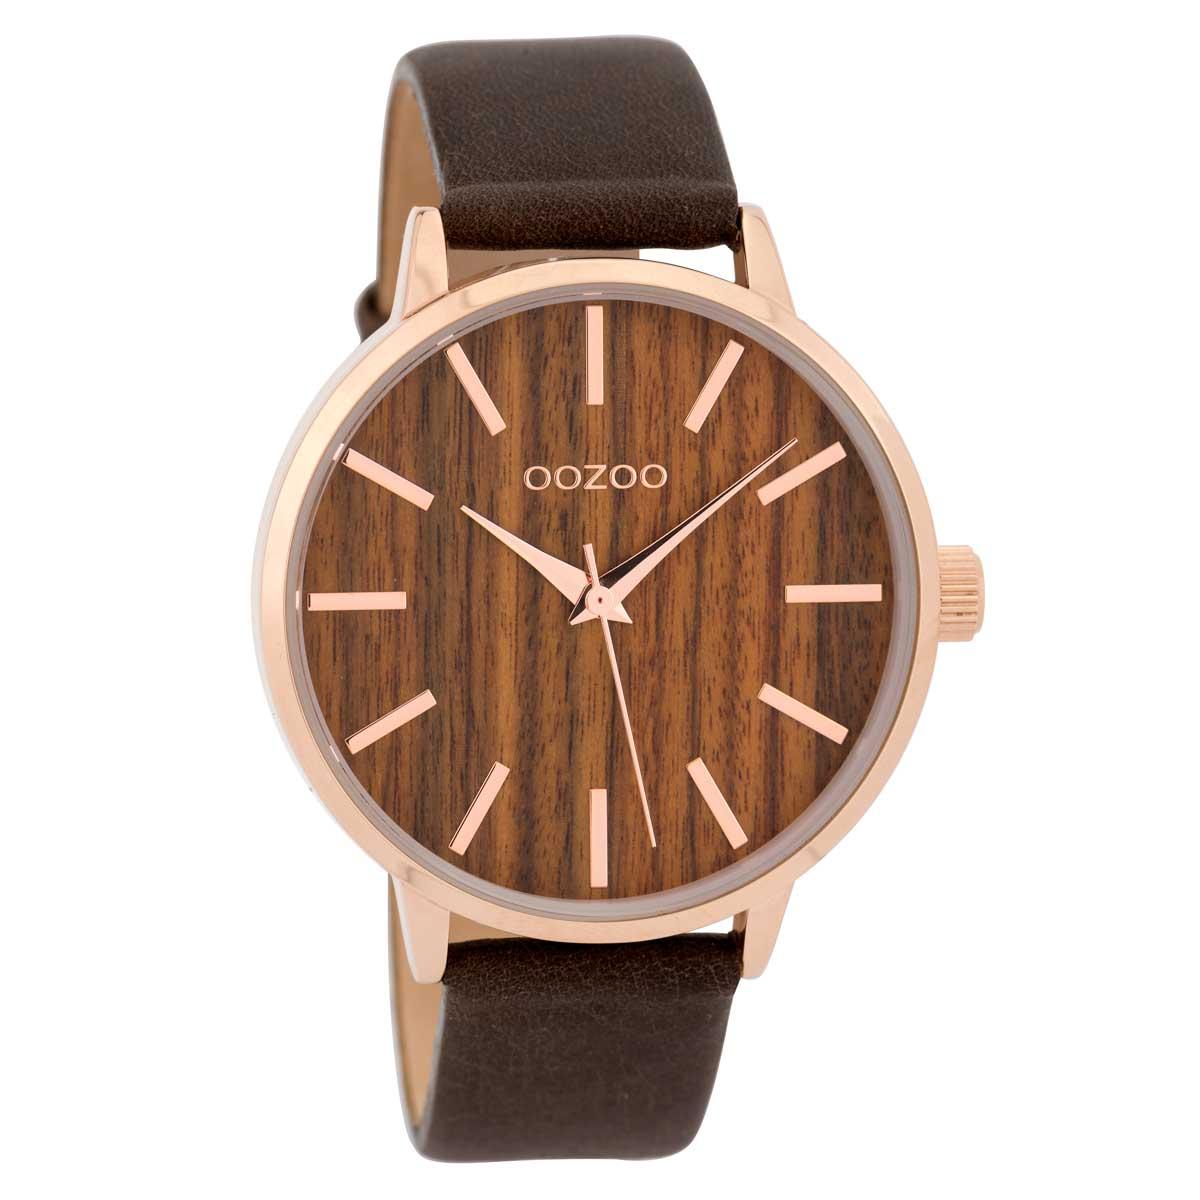 OOZOO Timepieces C9253 γυναικείο ρολόι με ροζ χρυσή μεταλλική κάσα ... e969e7e3652